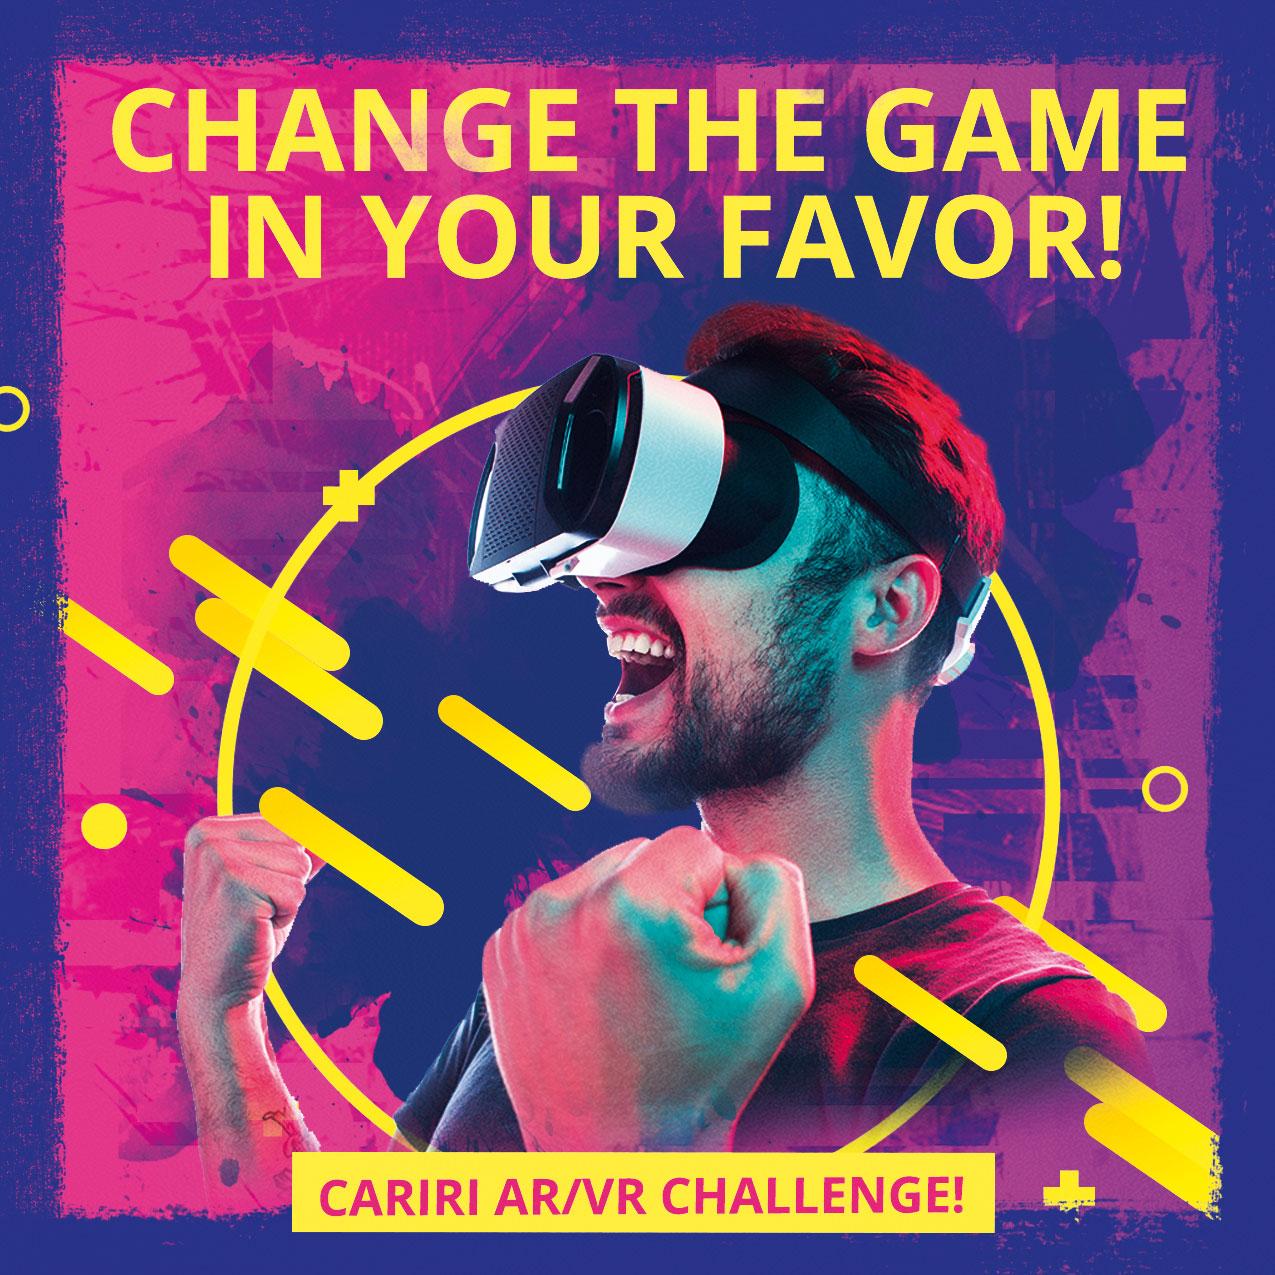 A Teaser Image for the CAIRIR AR/VR Challenge